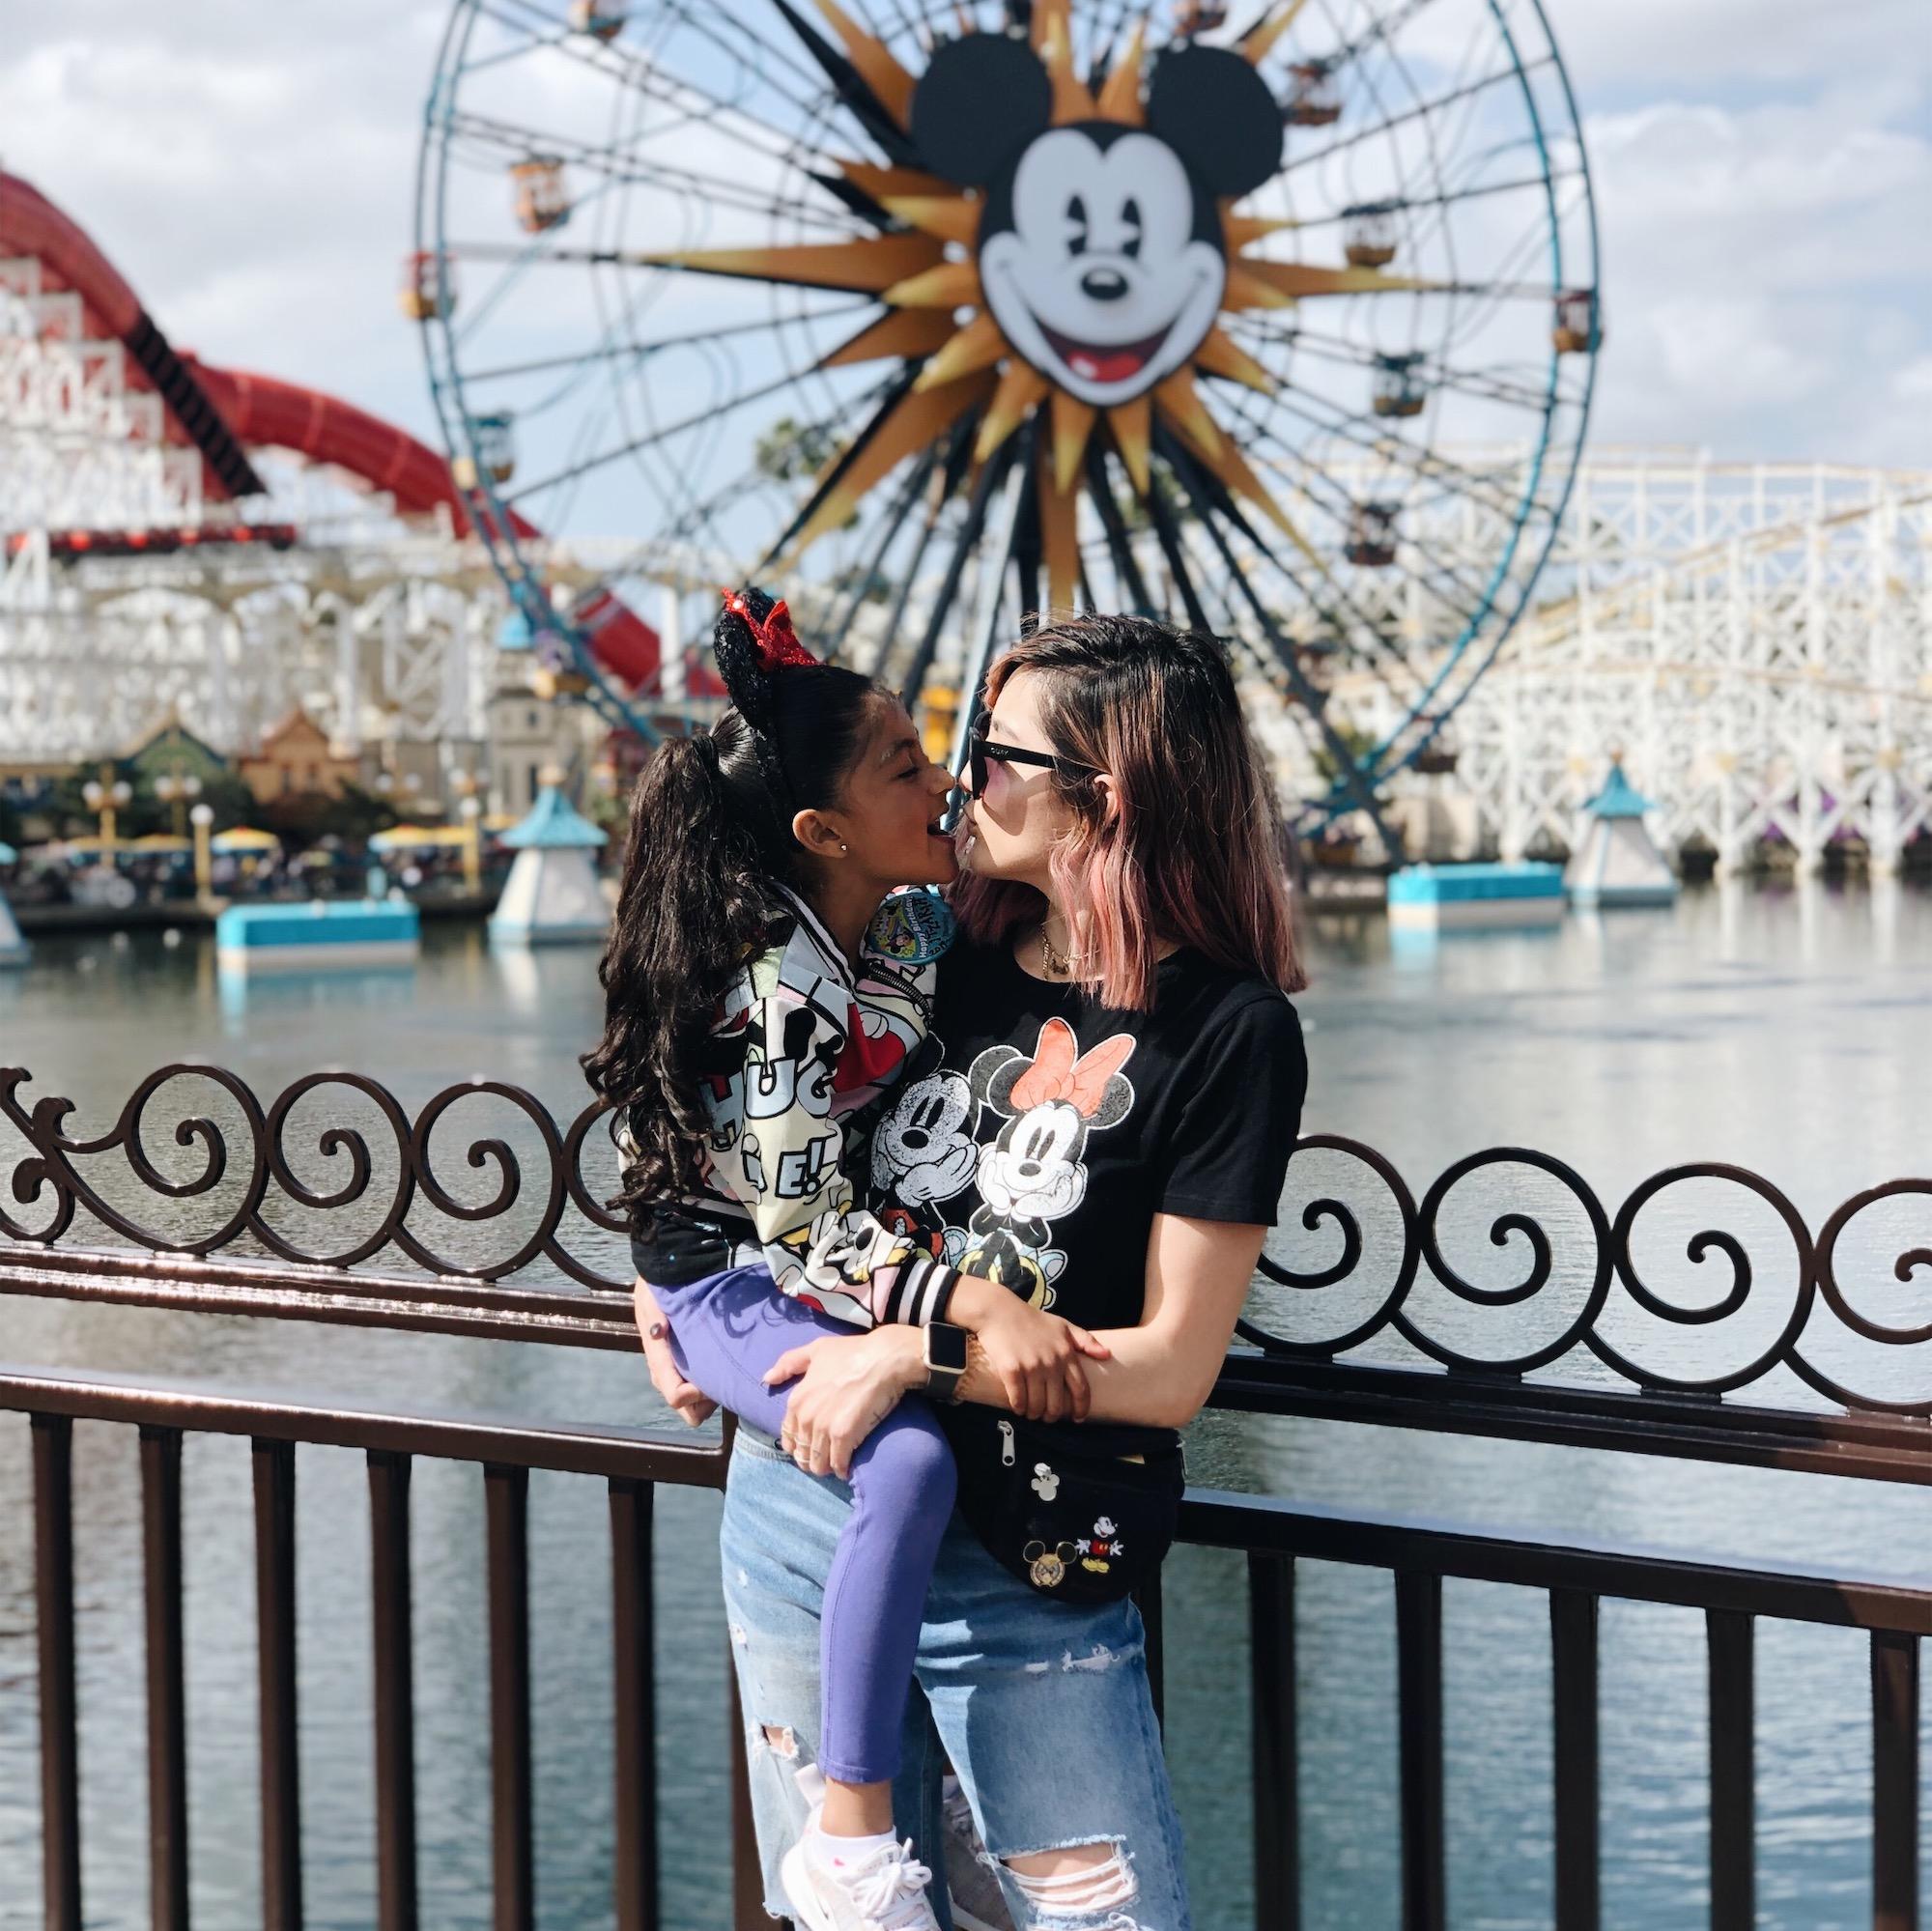 Day 3 - Disney California Adventure